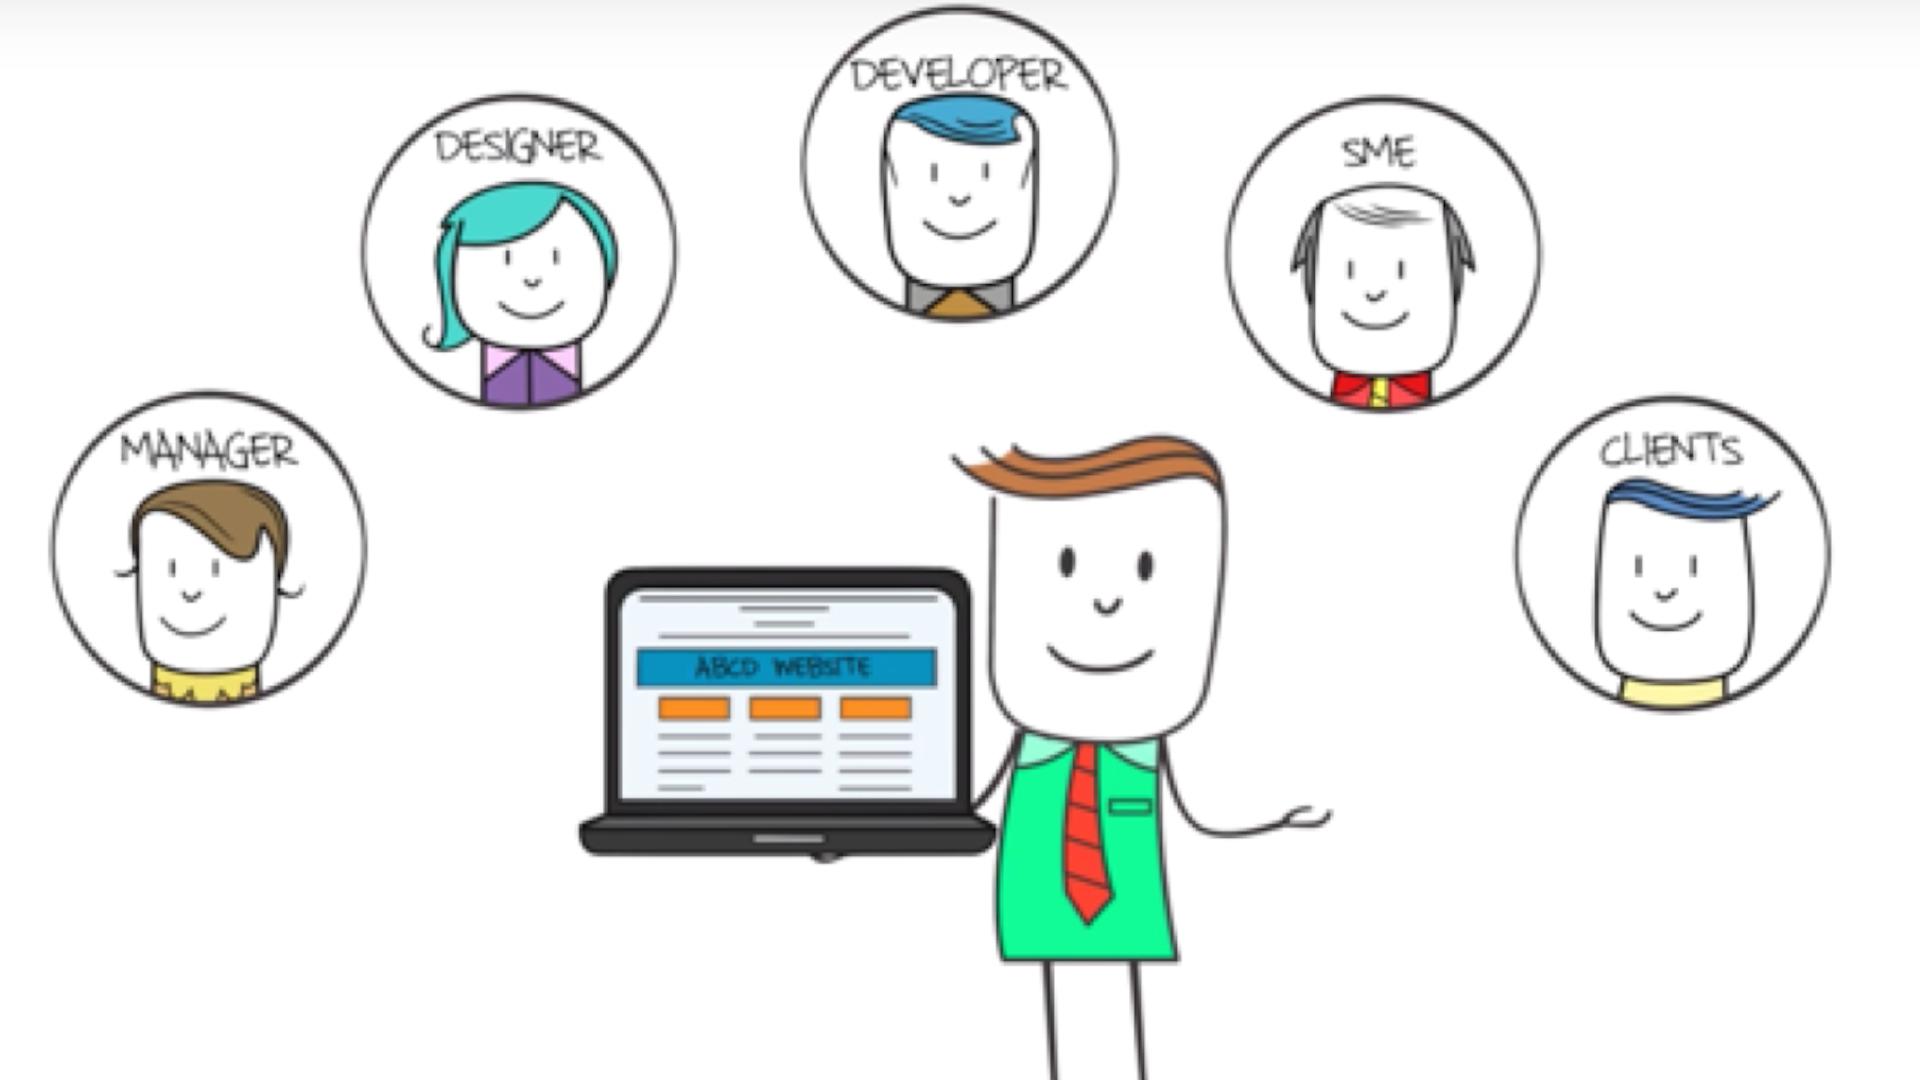 zipBoard brings all team members and external stakeholders on the same page during digital development